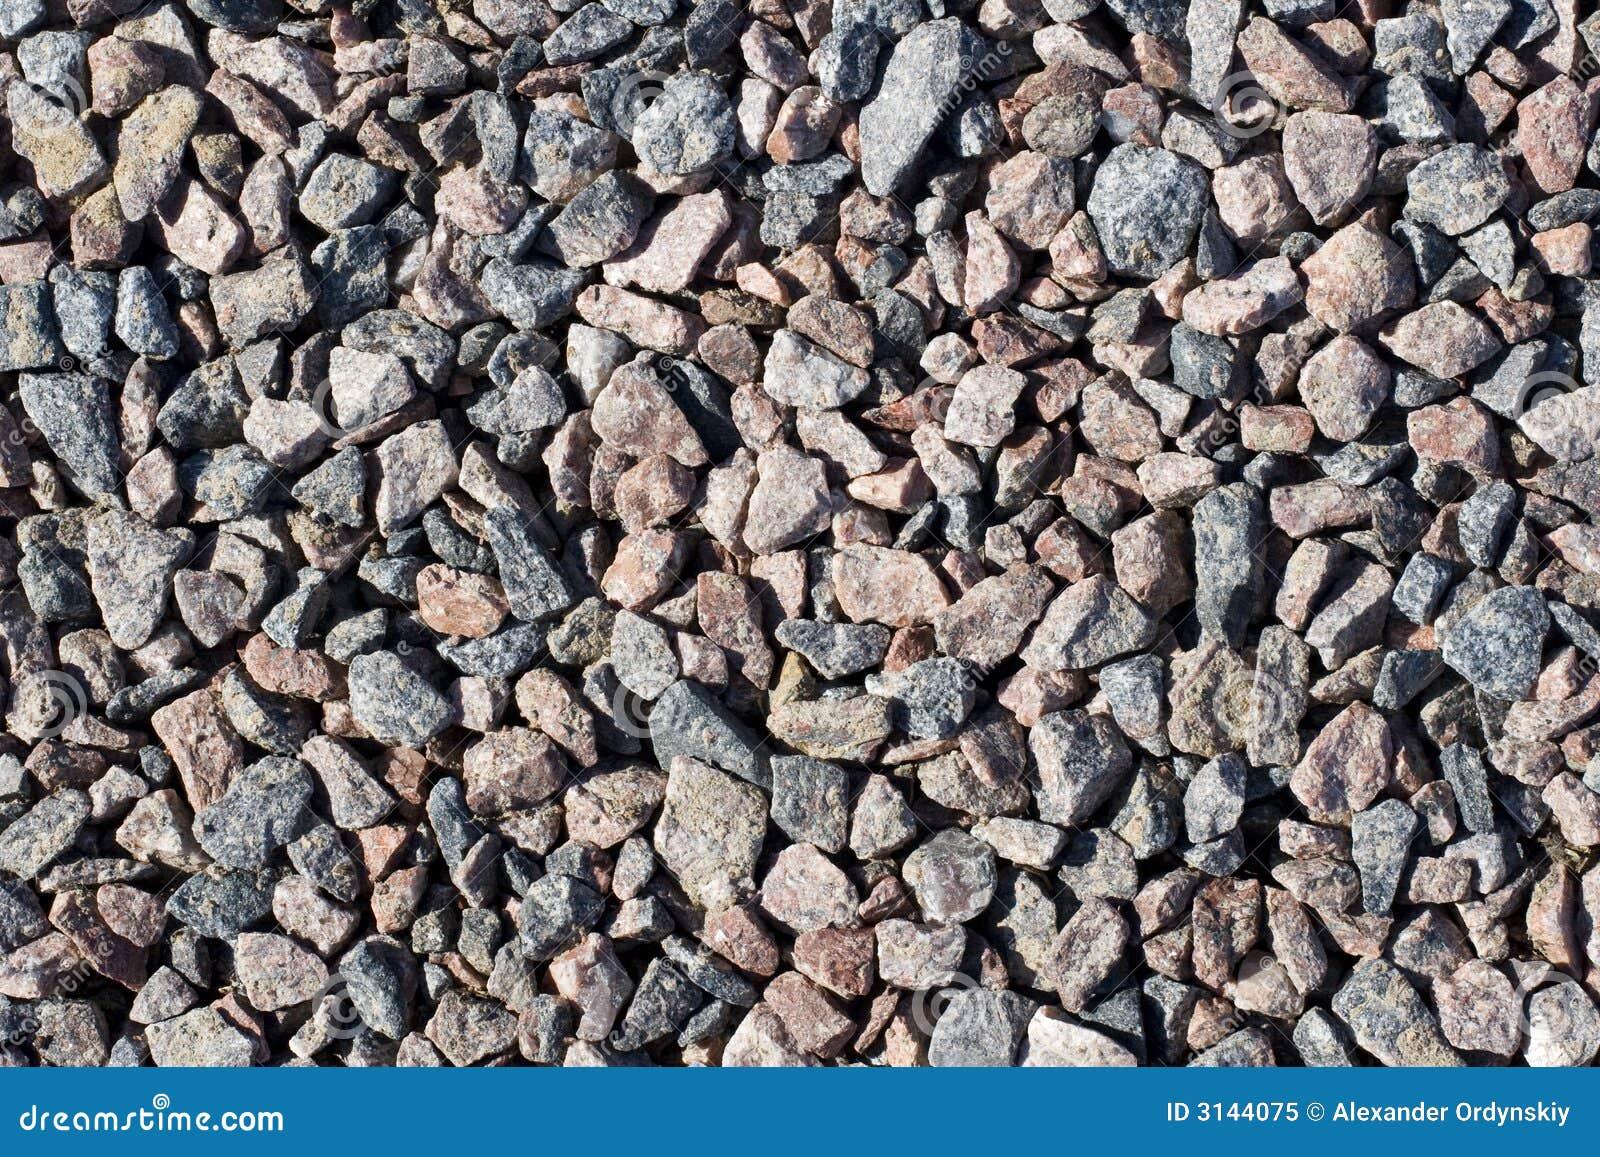 Small Rocks Background Royalty Free Stock Photo Image